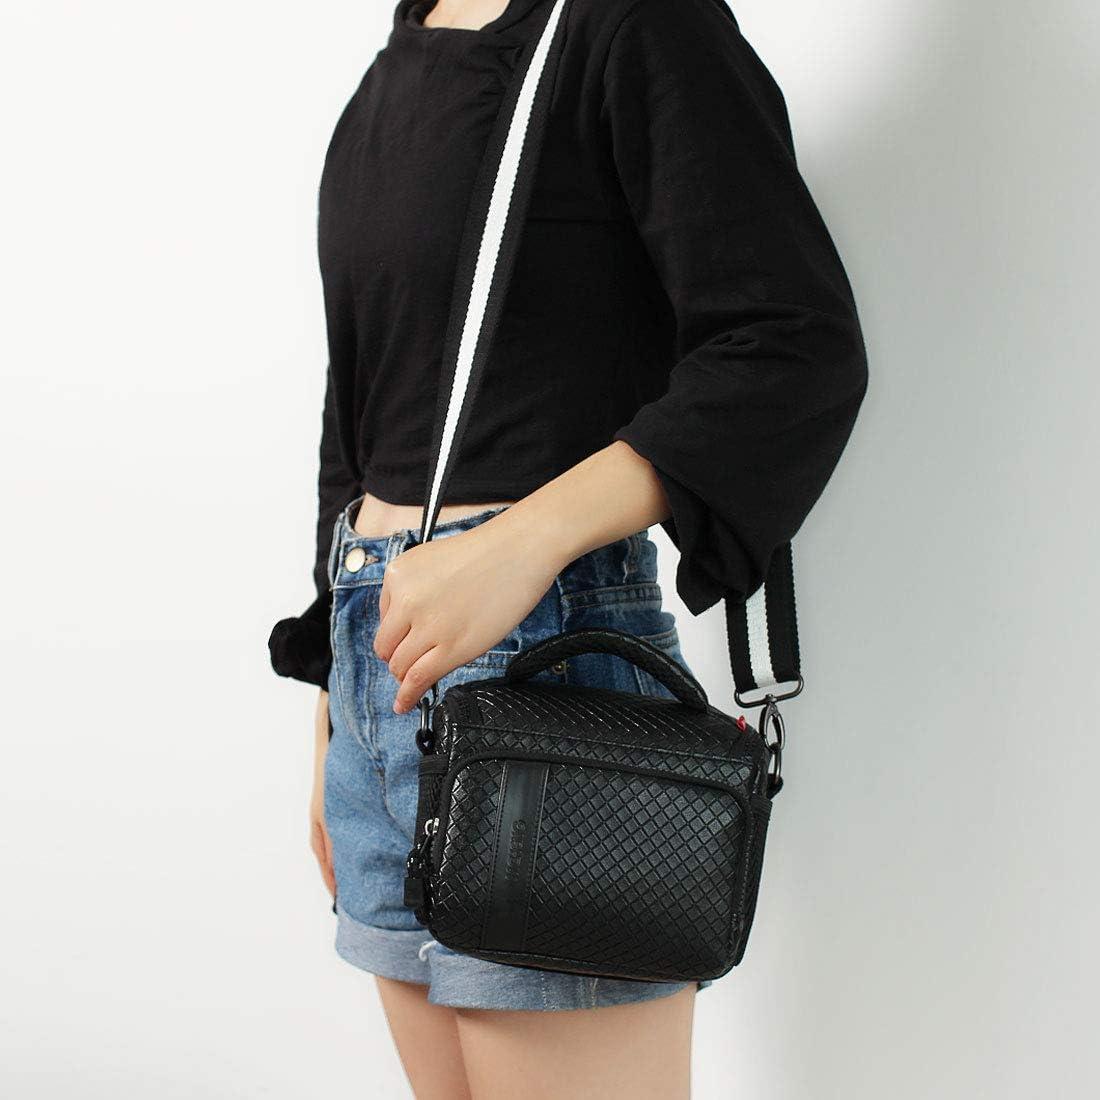 Black MCHENG Waterproof PU Leather Camera Bag for Canon Nikon Sony Panasonic Olympus Fujifilm Digital Cameras